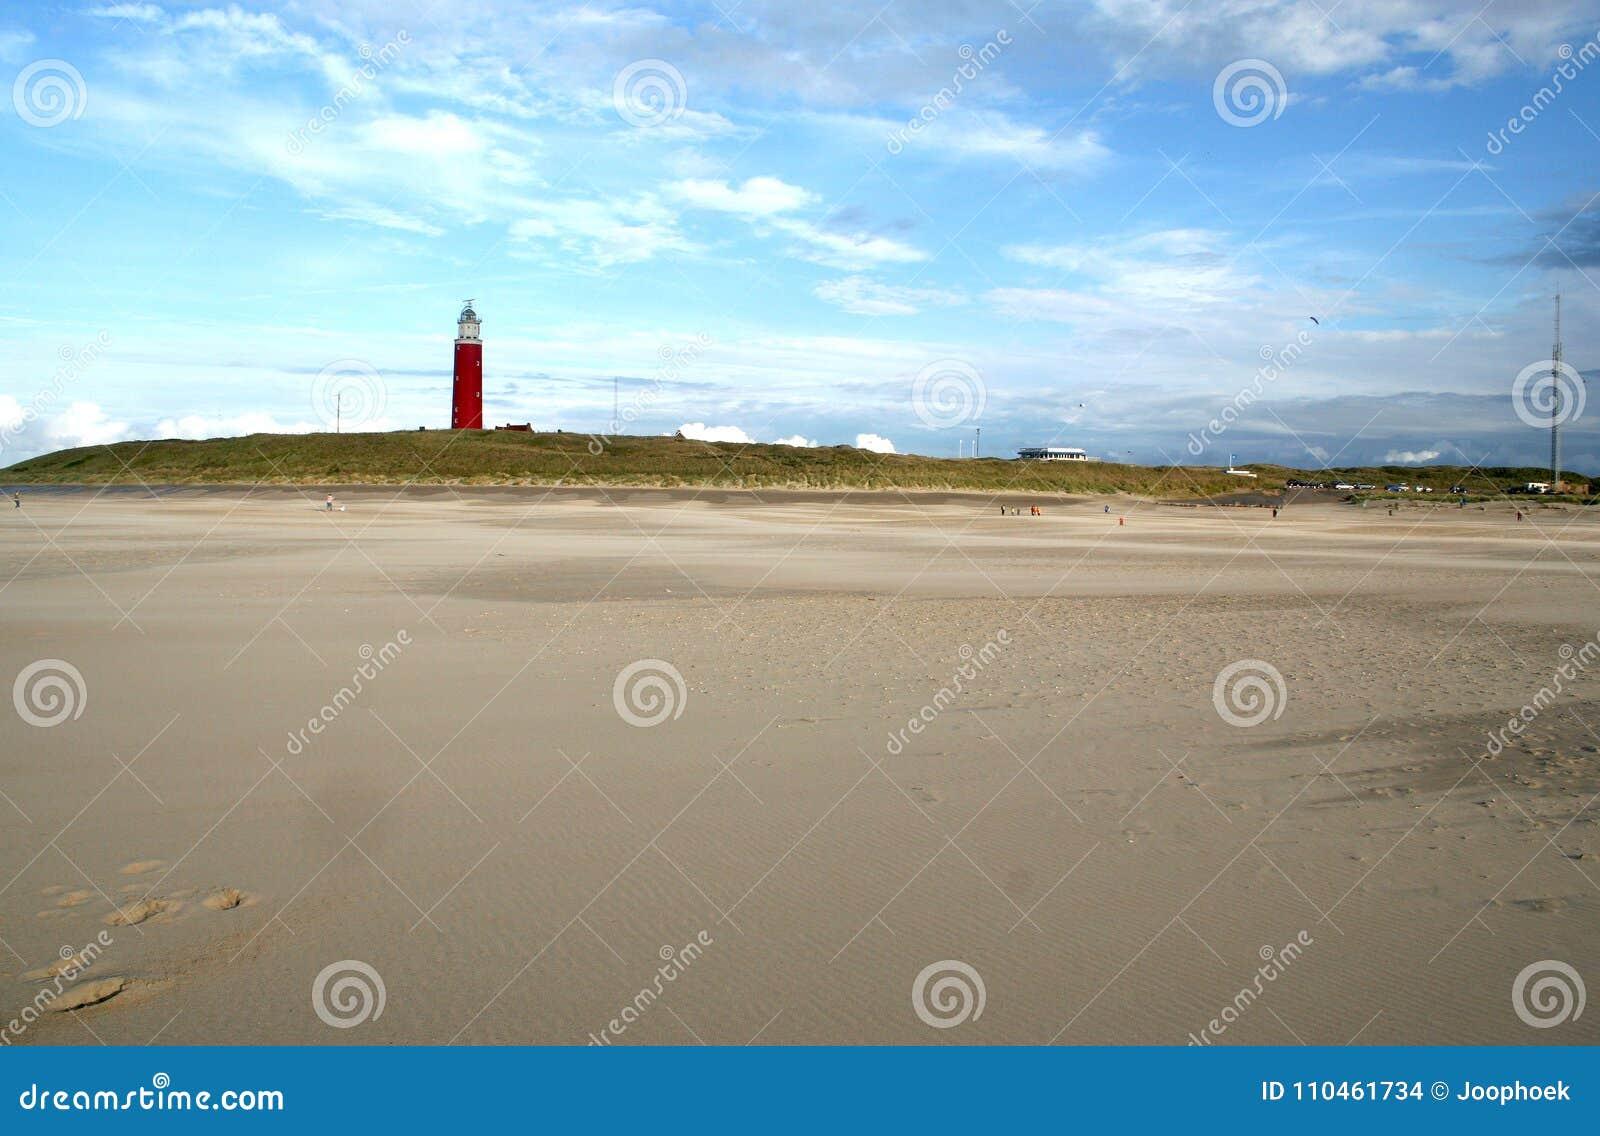 Det ljusa huset på stranden Texel caleds Eierlanden